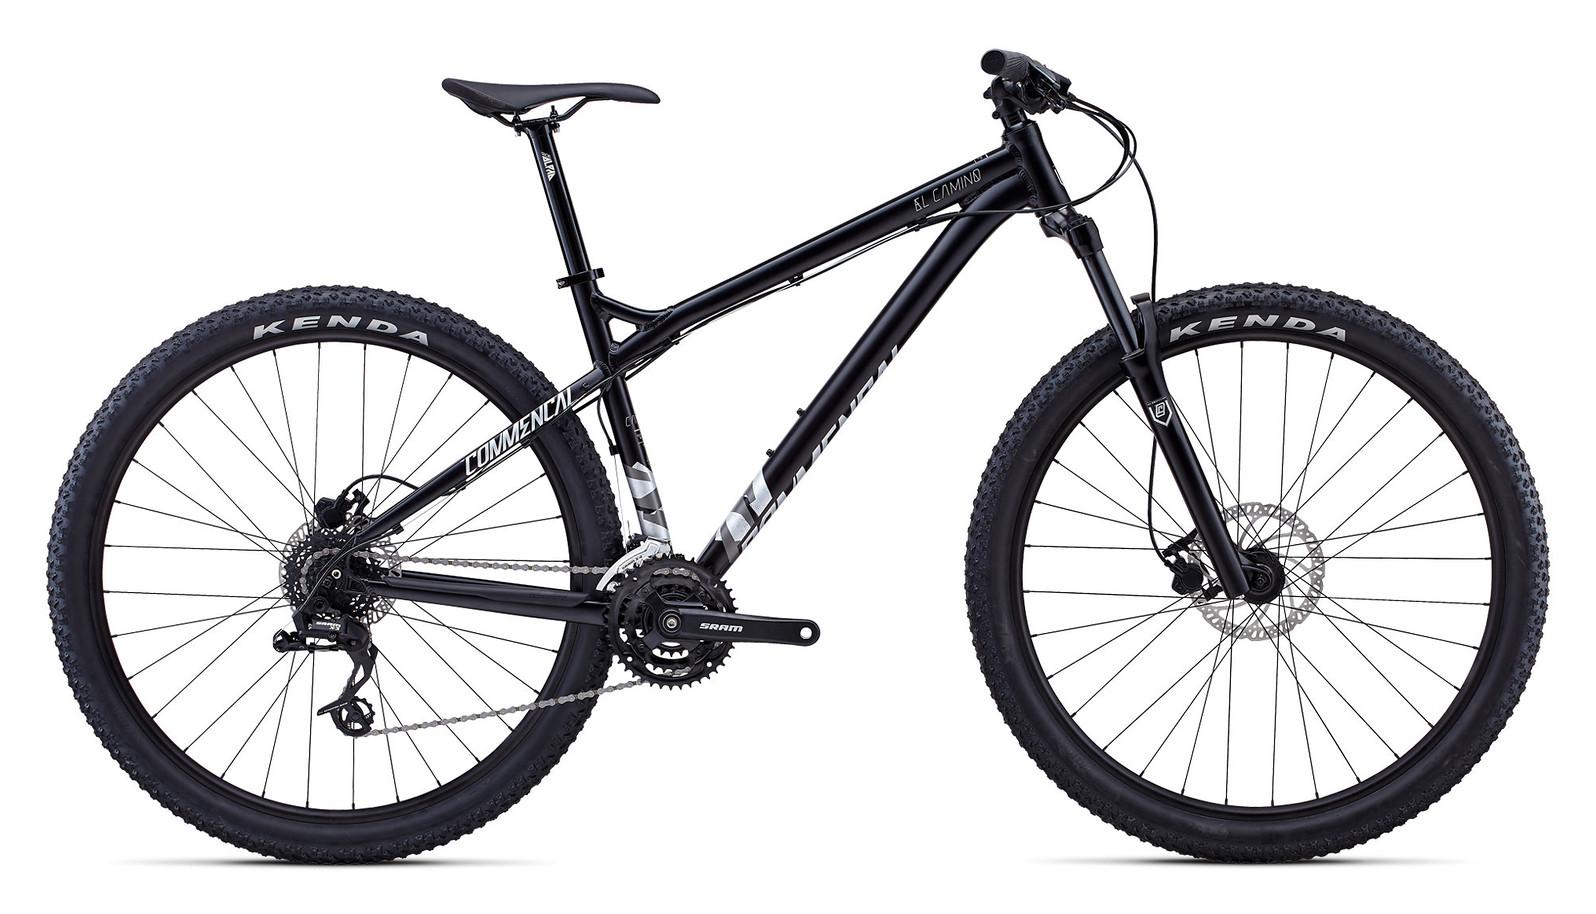 2018 Commencal El Camino Bike